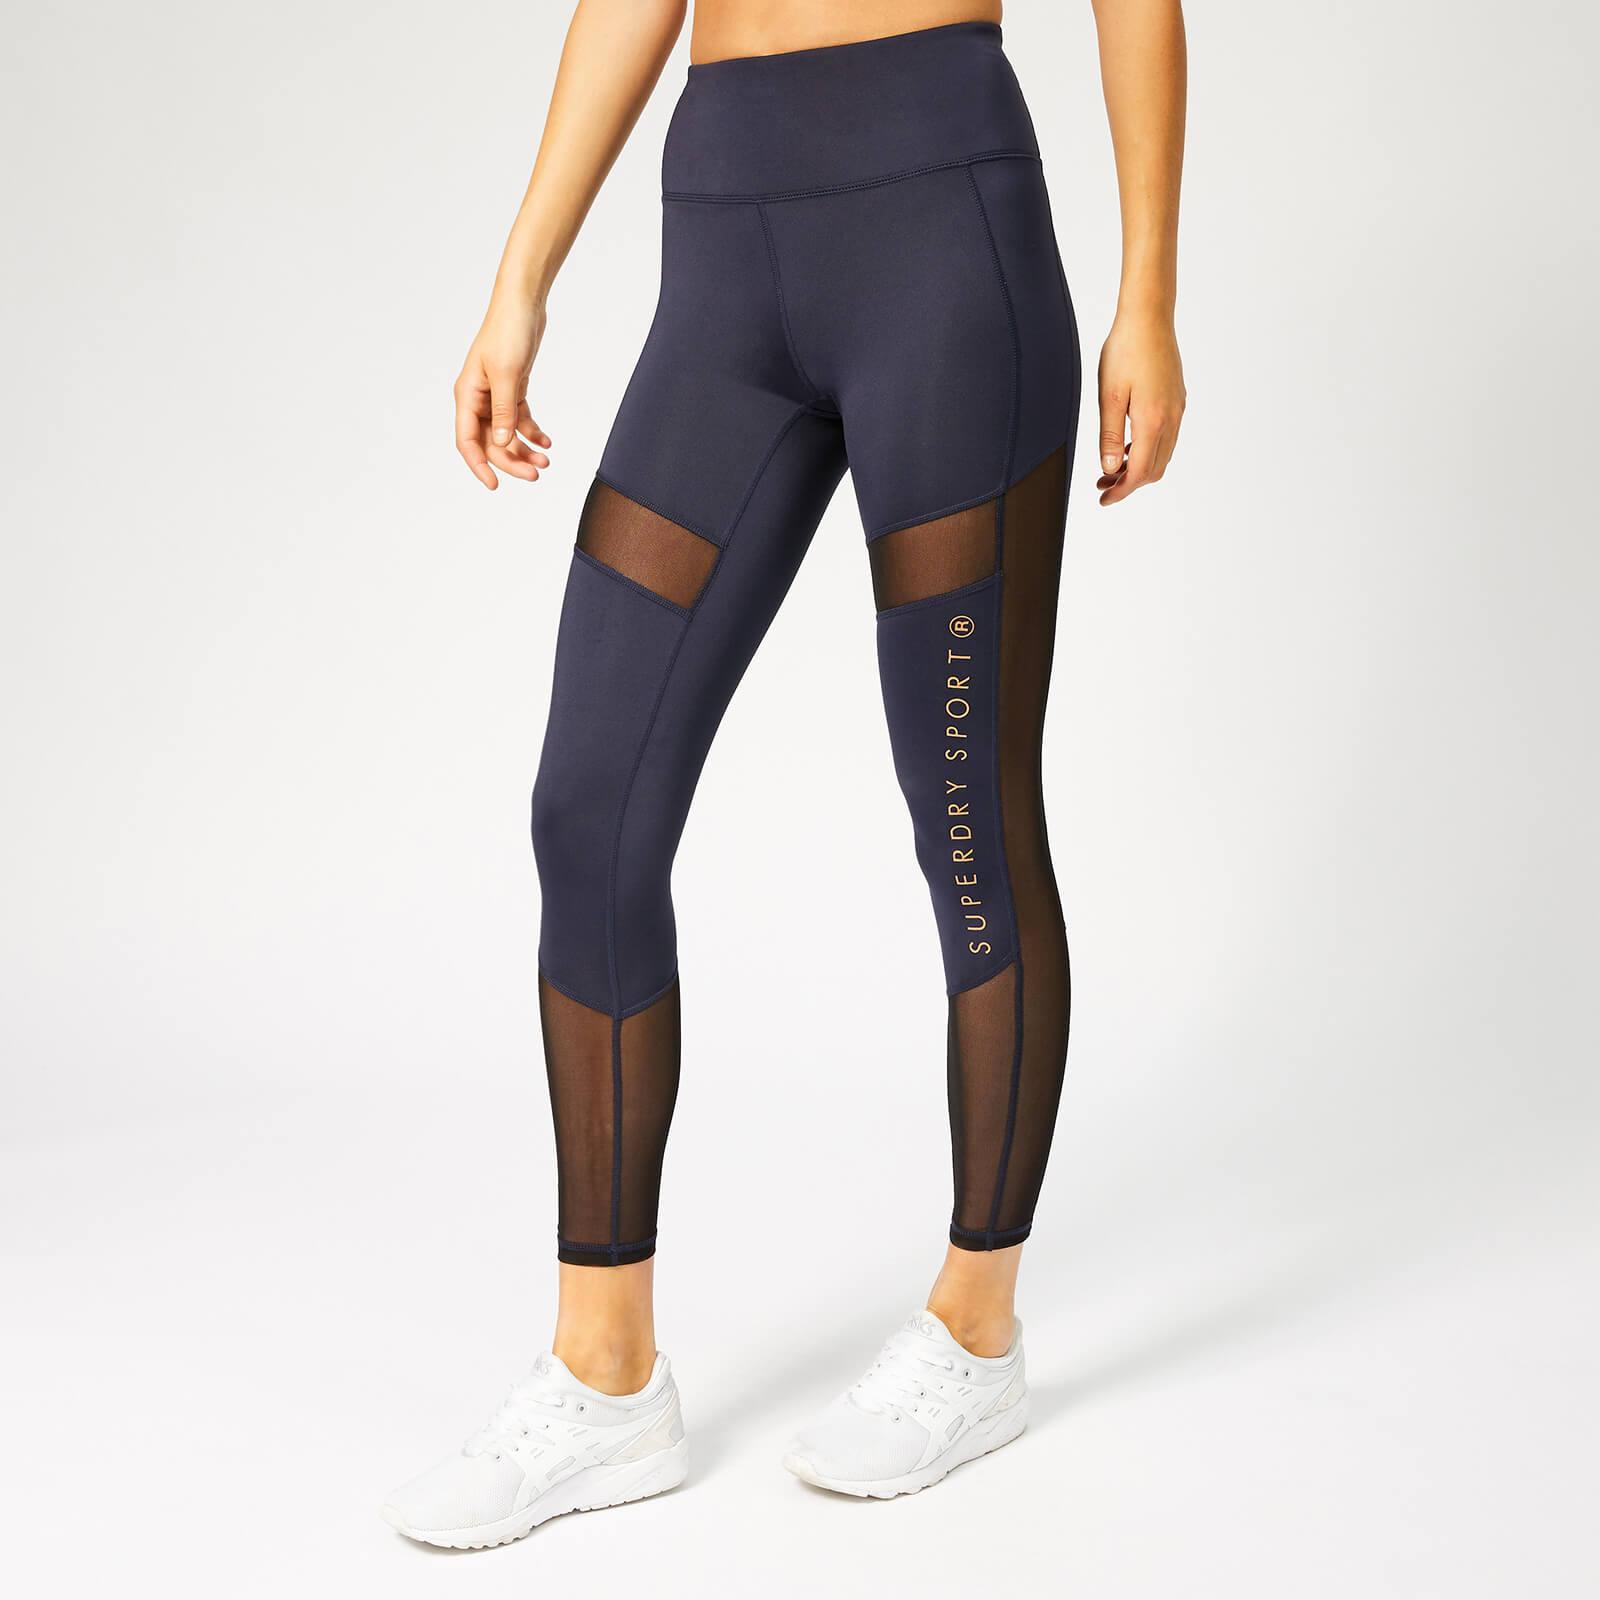 Superdry Sport Women's Active Studio Mesh Leggings - Eclispe Navy Marl - L - Blue